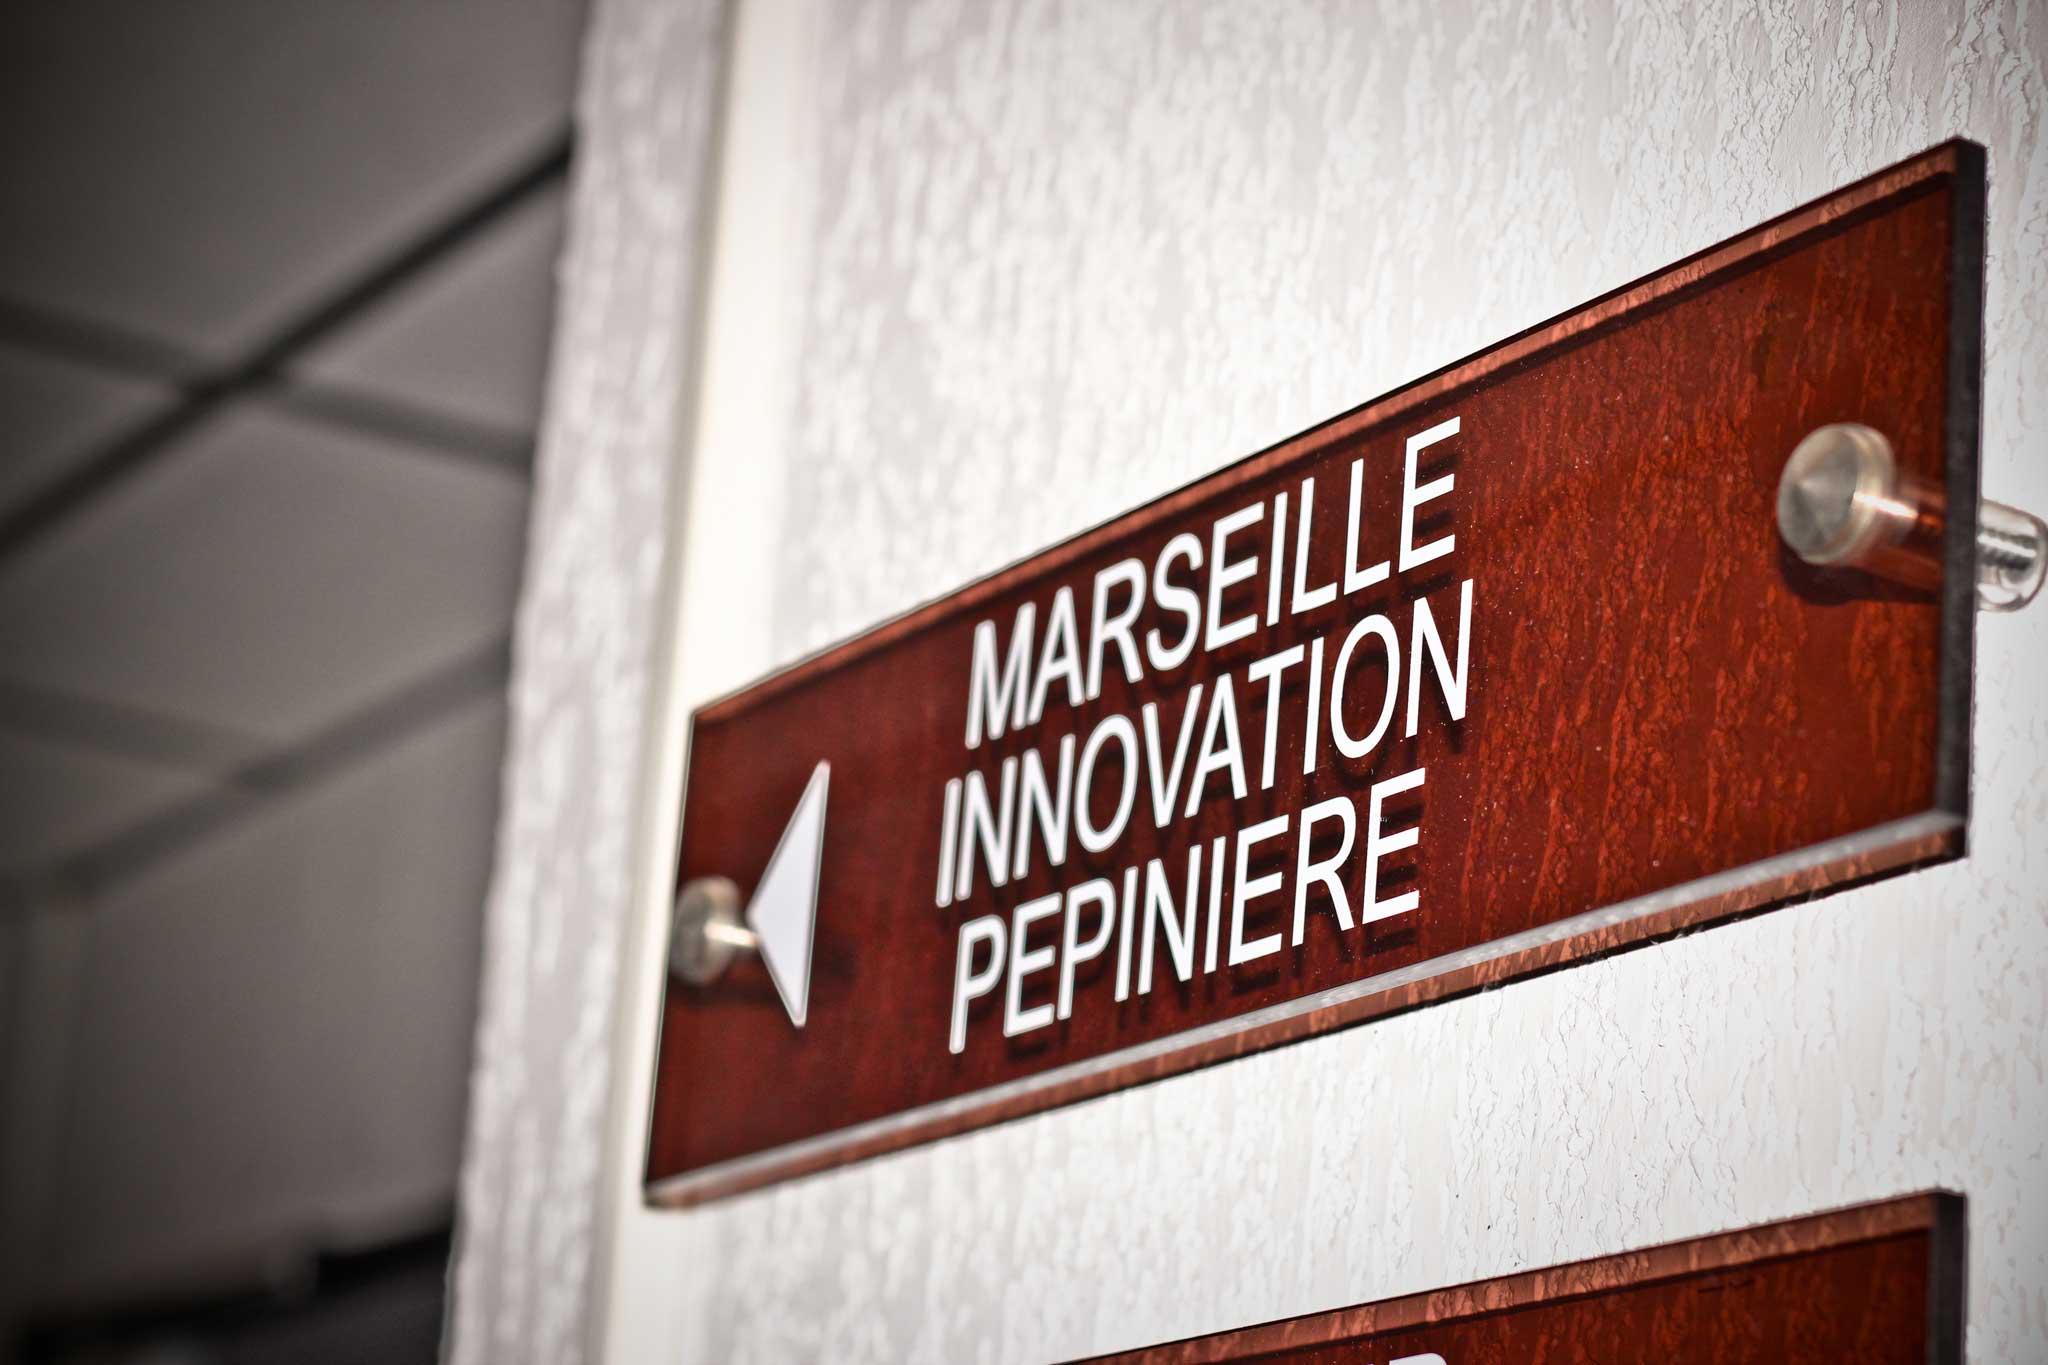 Pépinière Marseille Innovation